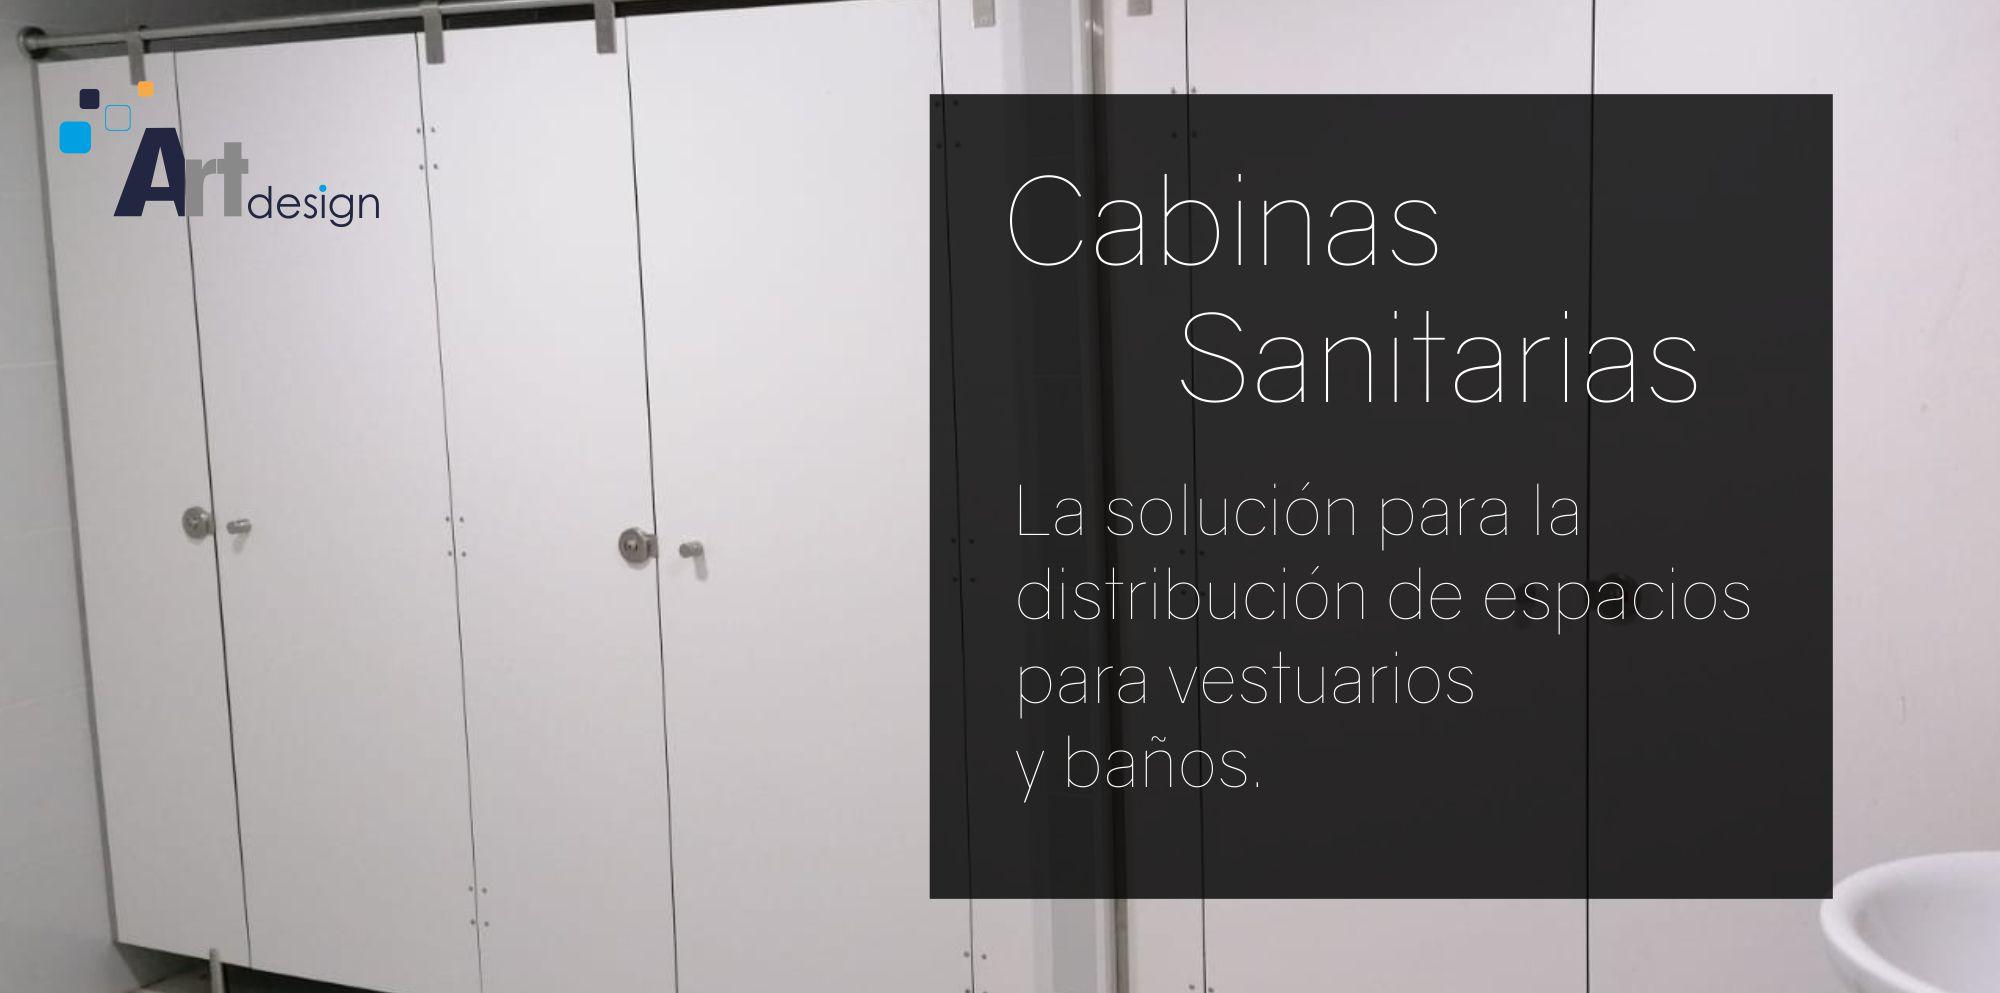 Cabinas Sanitarias en Murcia - Láminas hpl Rótulos Art Design